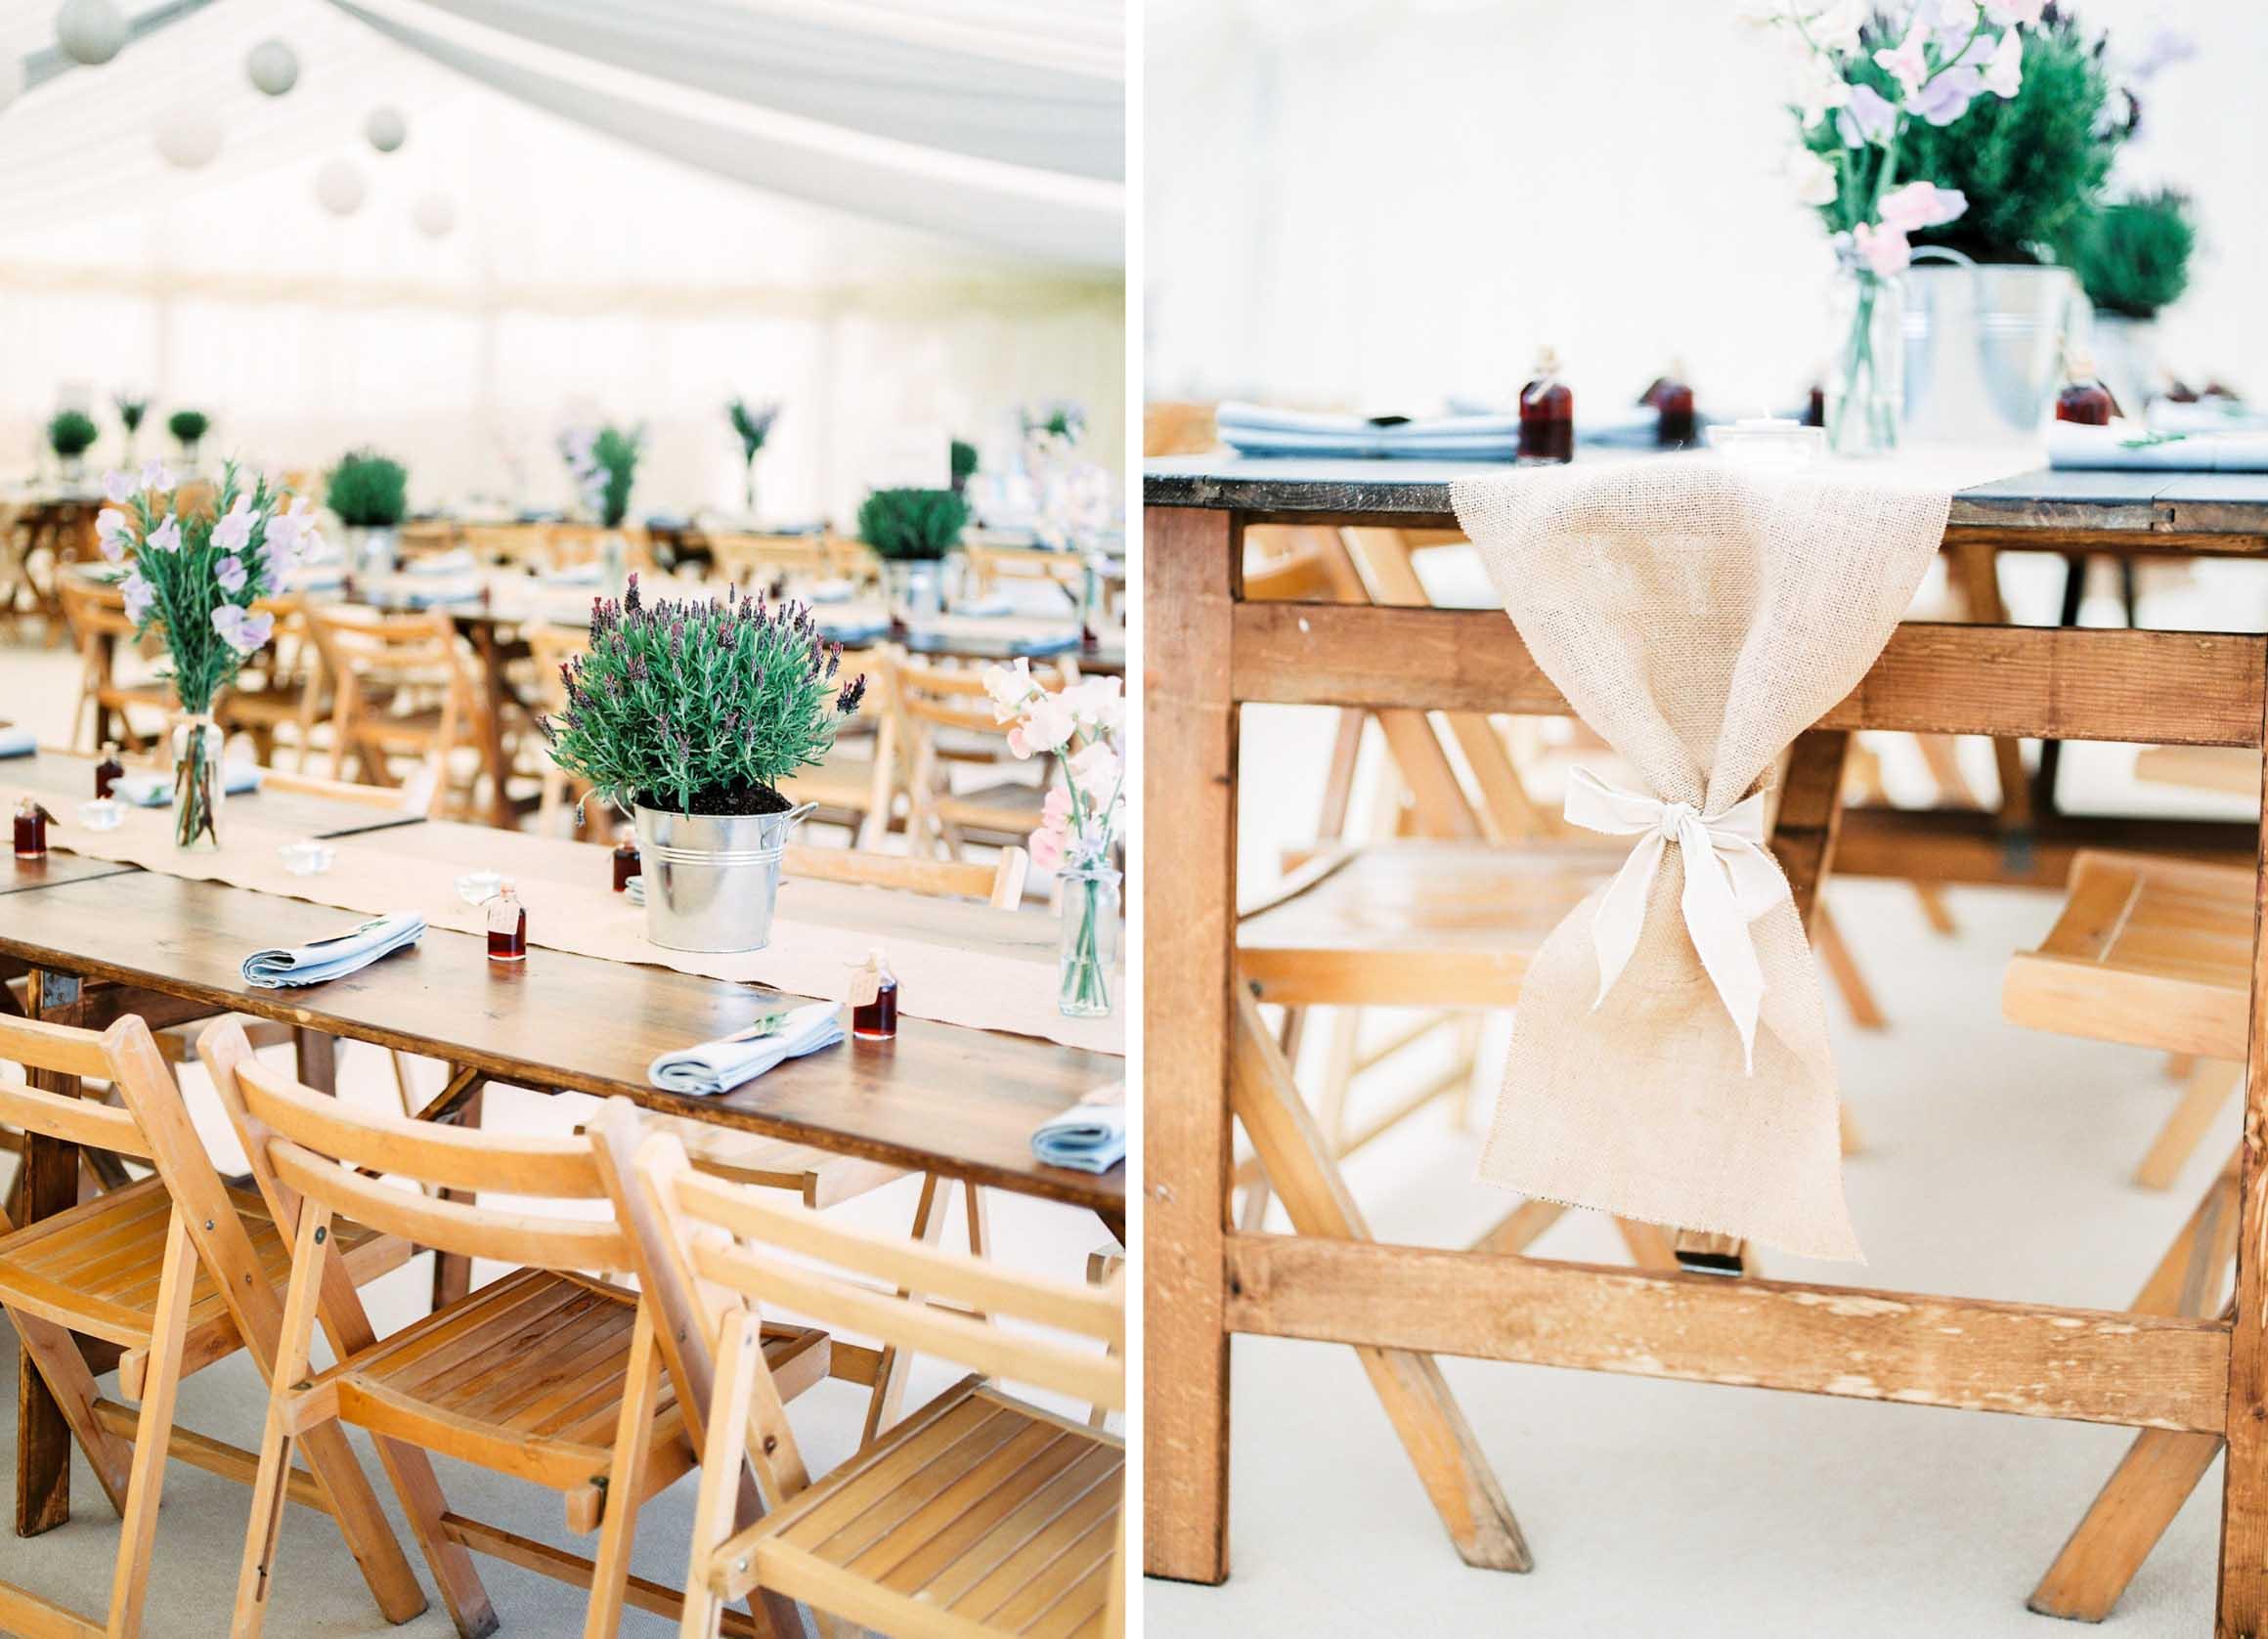 Amy O'Boyle Photography- Destination & UK Fine Art Film Wedding Photographer- English Country Wedding14.jpg